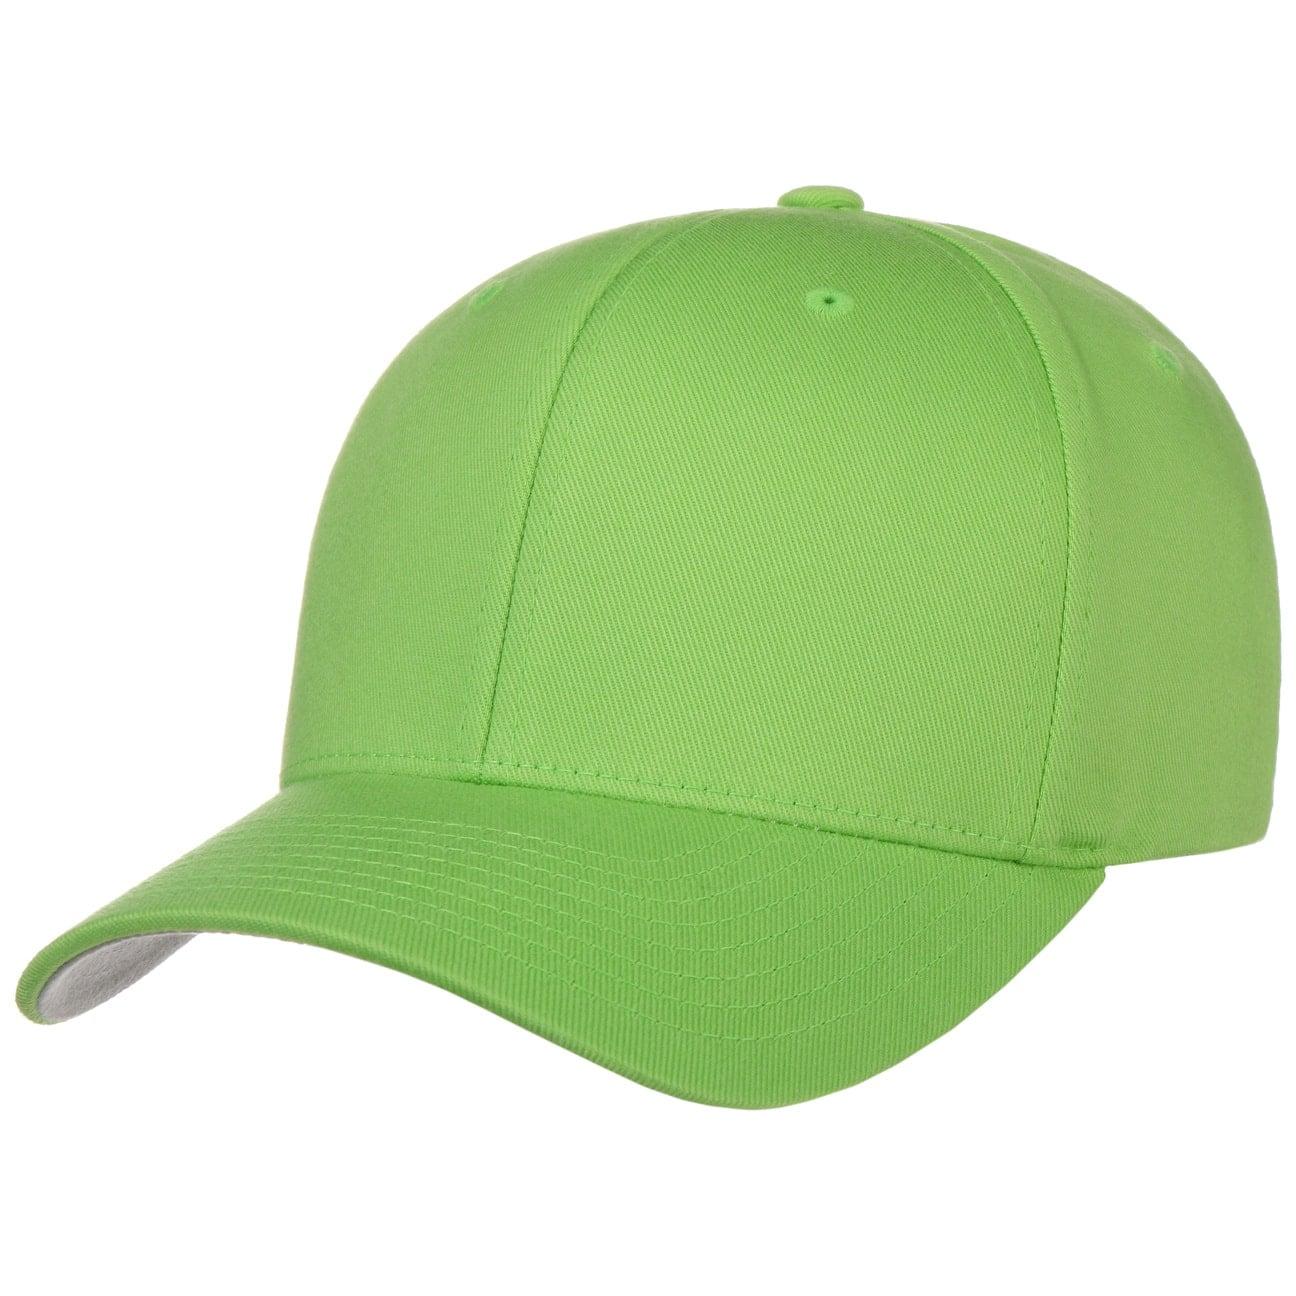 Gorra flexfit spandex verde claro jpg 1296x1296 Gorra verde 78915b140f1